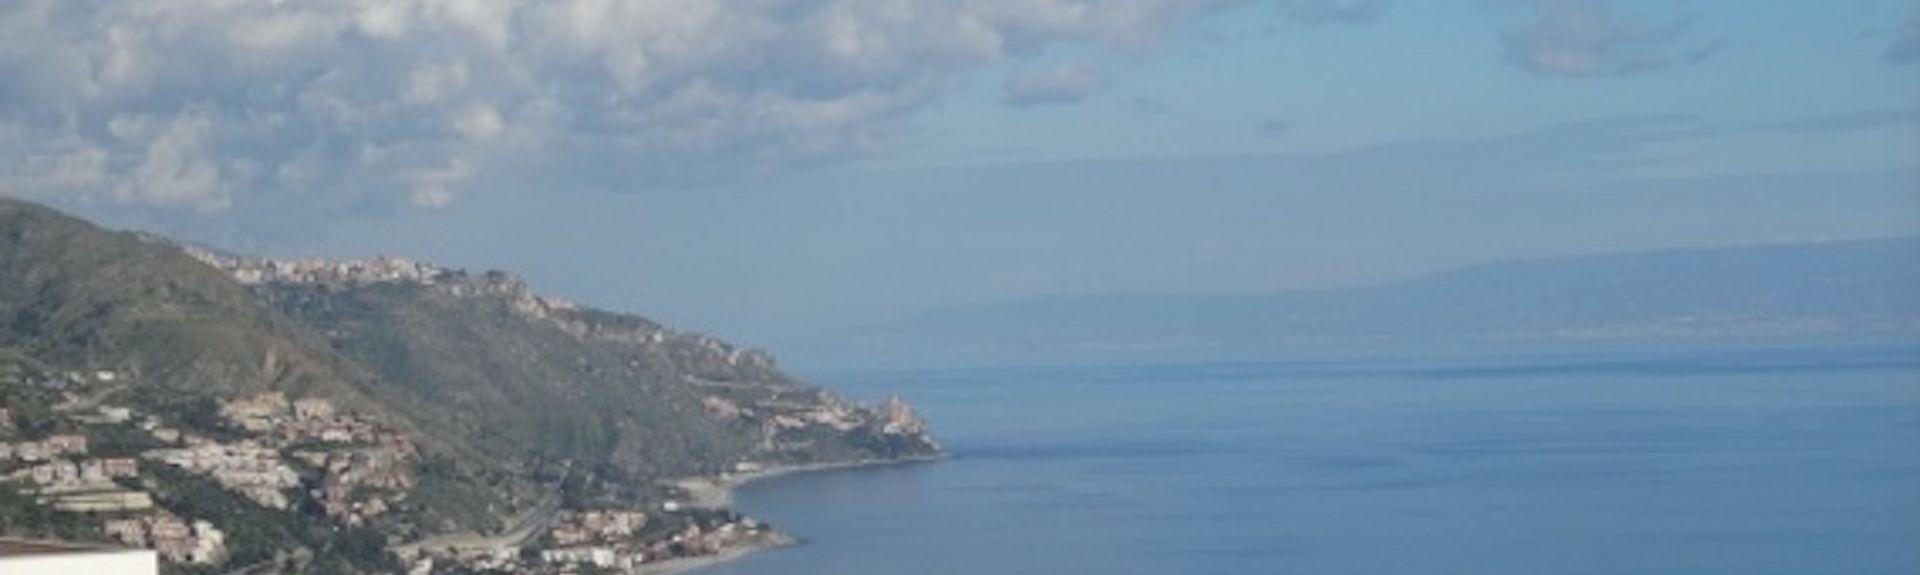 Isola Bella, Taormina, Sicilia, Italia